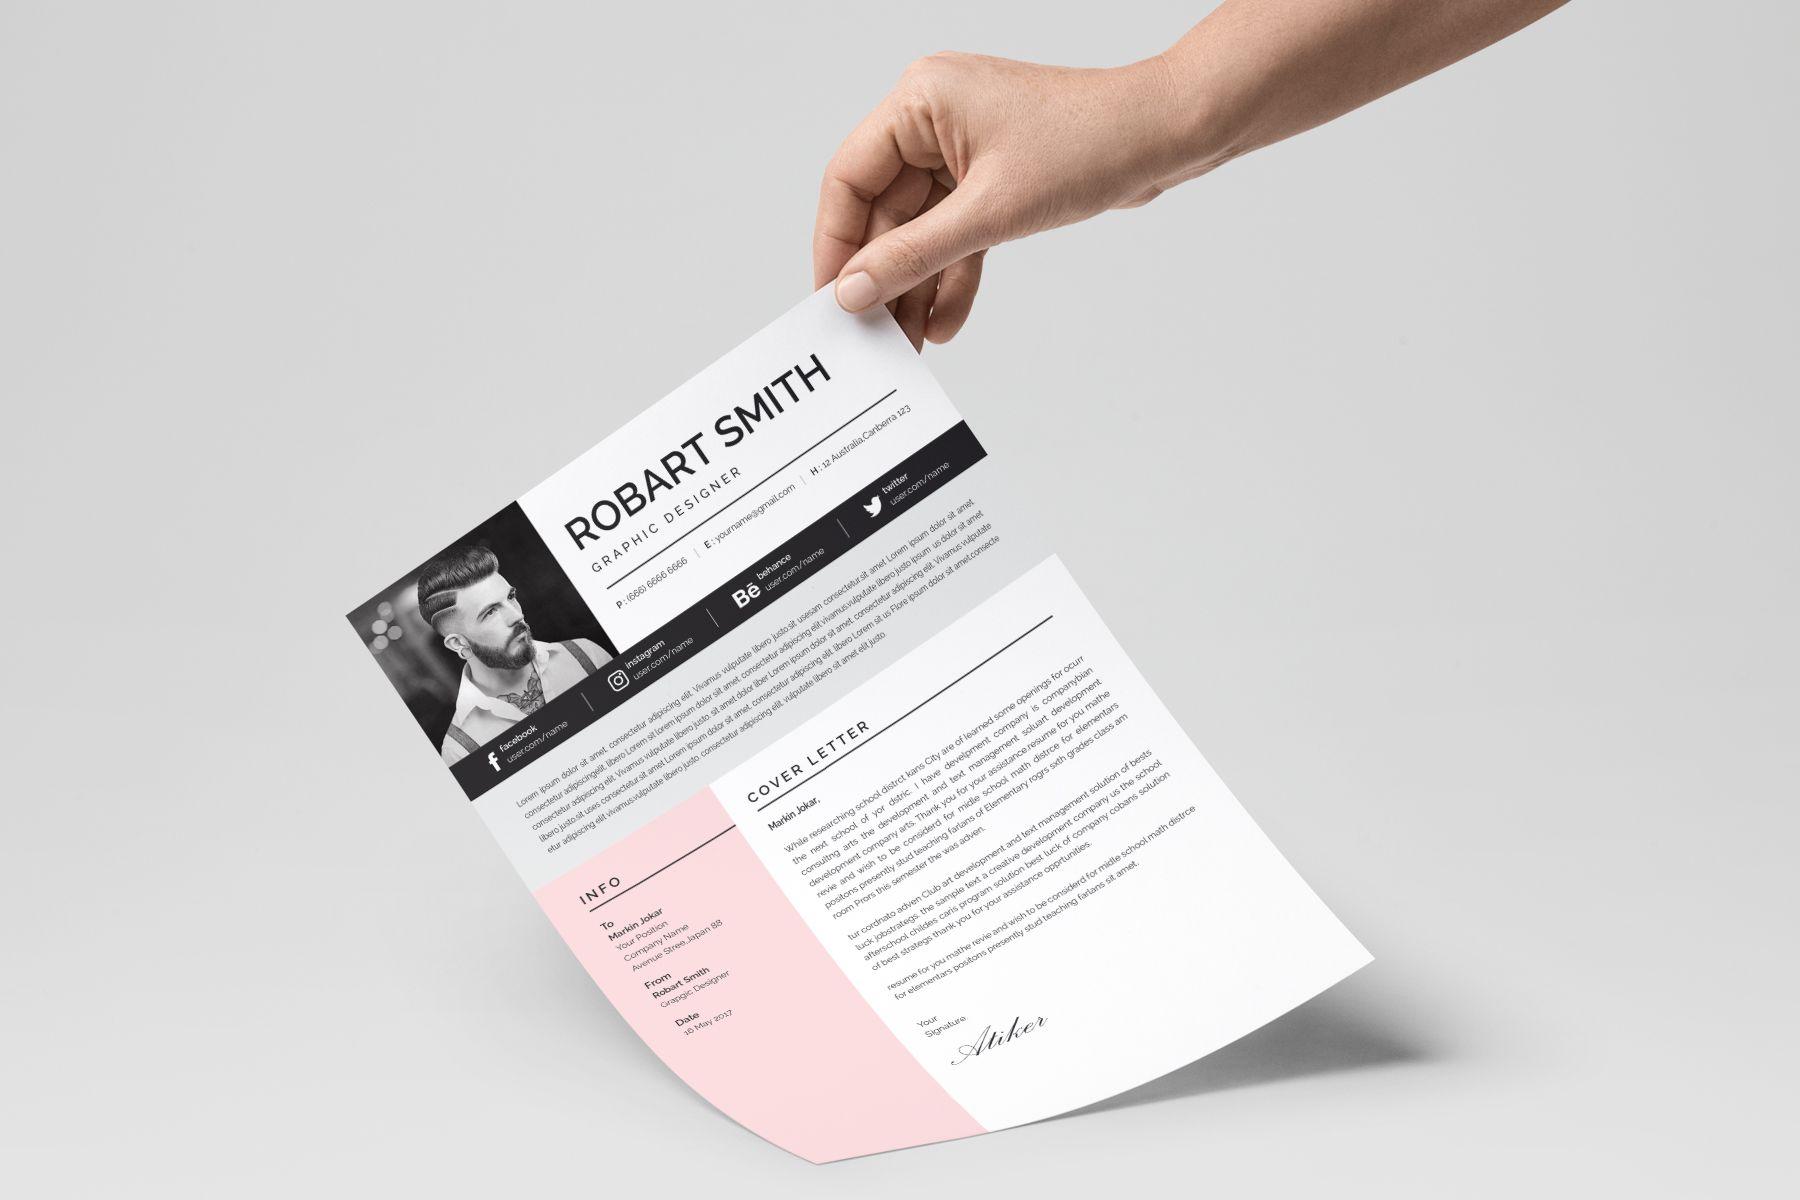 Robart Professional & Modern Resume Template | Packaging Design ...